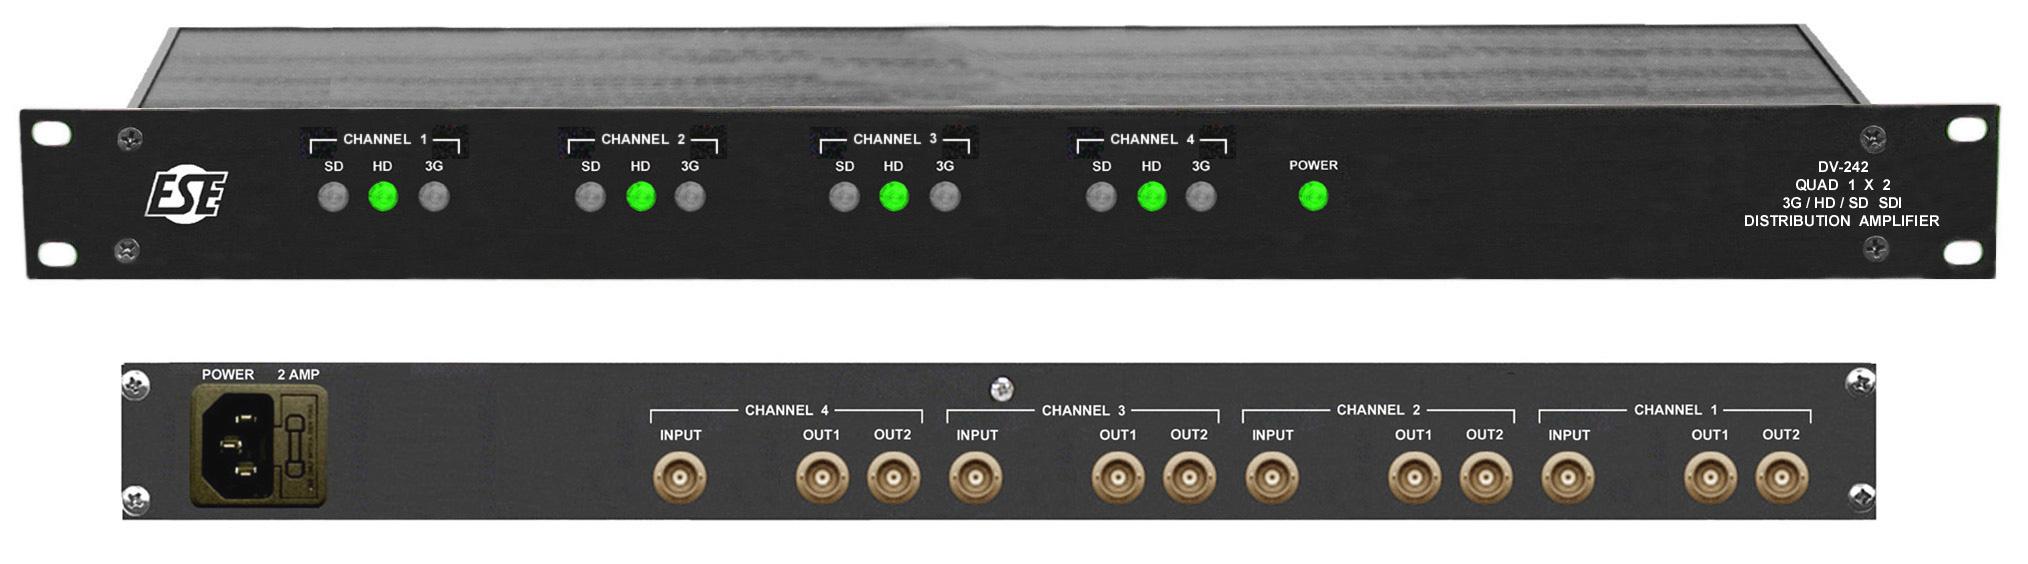 Ese Dv 242 3g Hd Sd Sdi Reclocking Distribution Amplifier